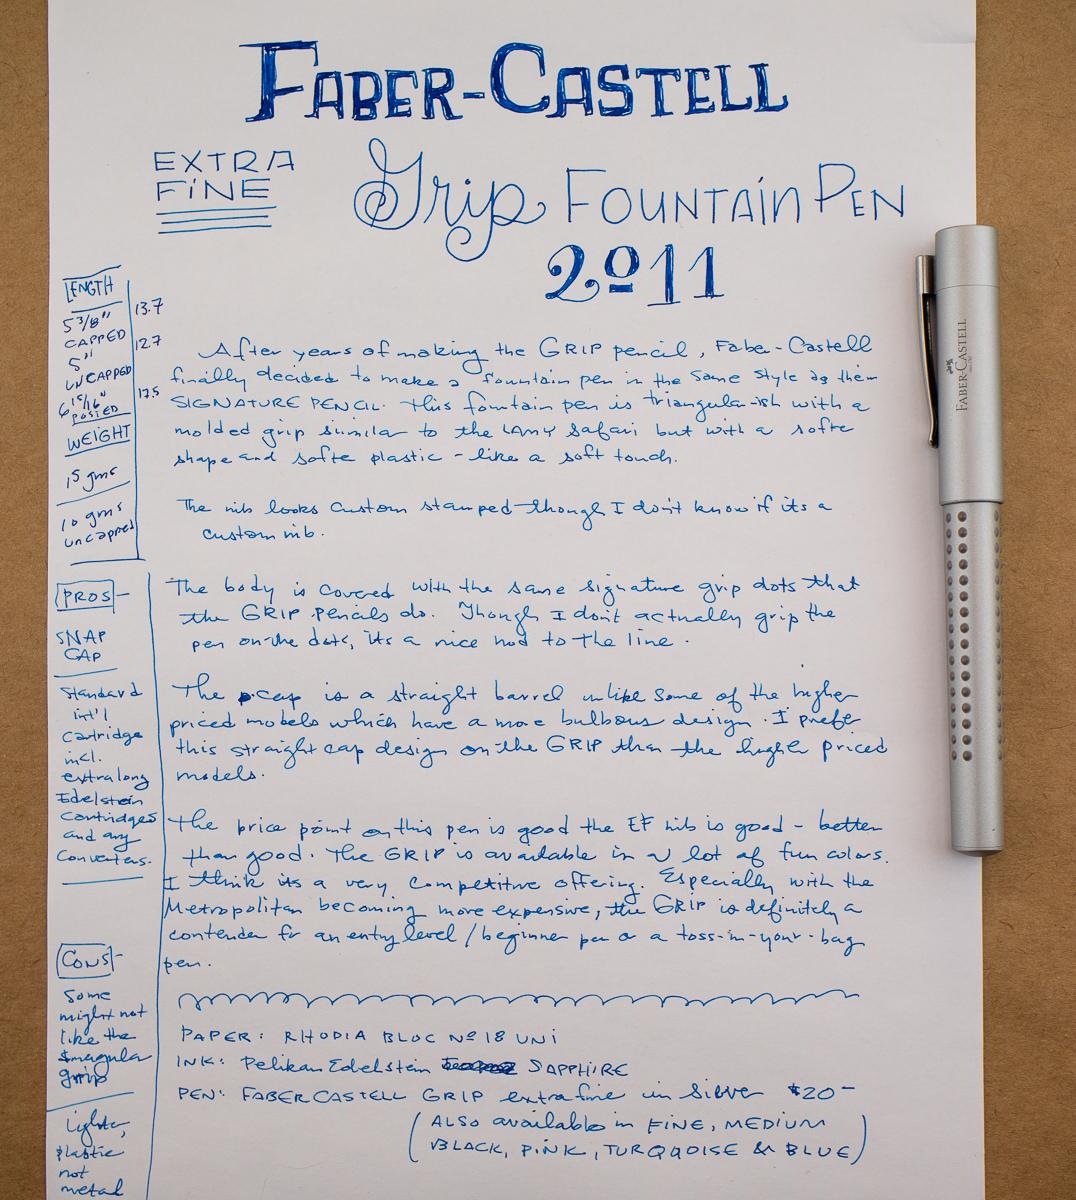 Faber-Castell Gripp 2011 Fountain Pen writing sample